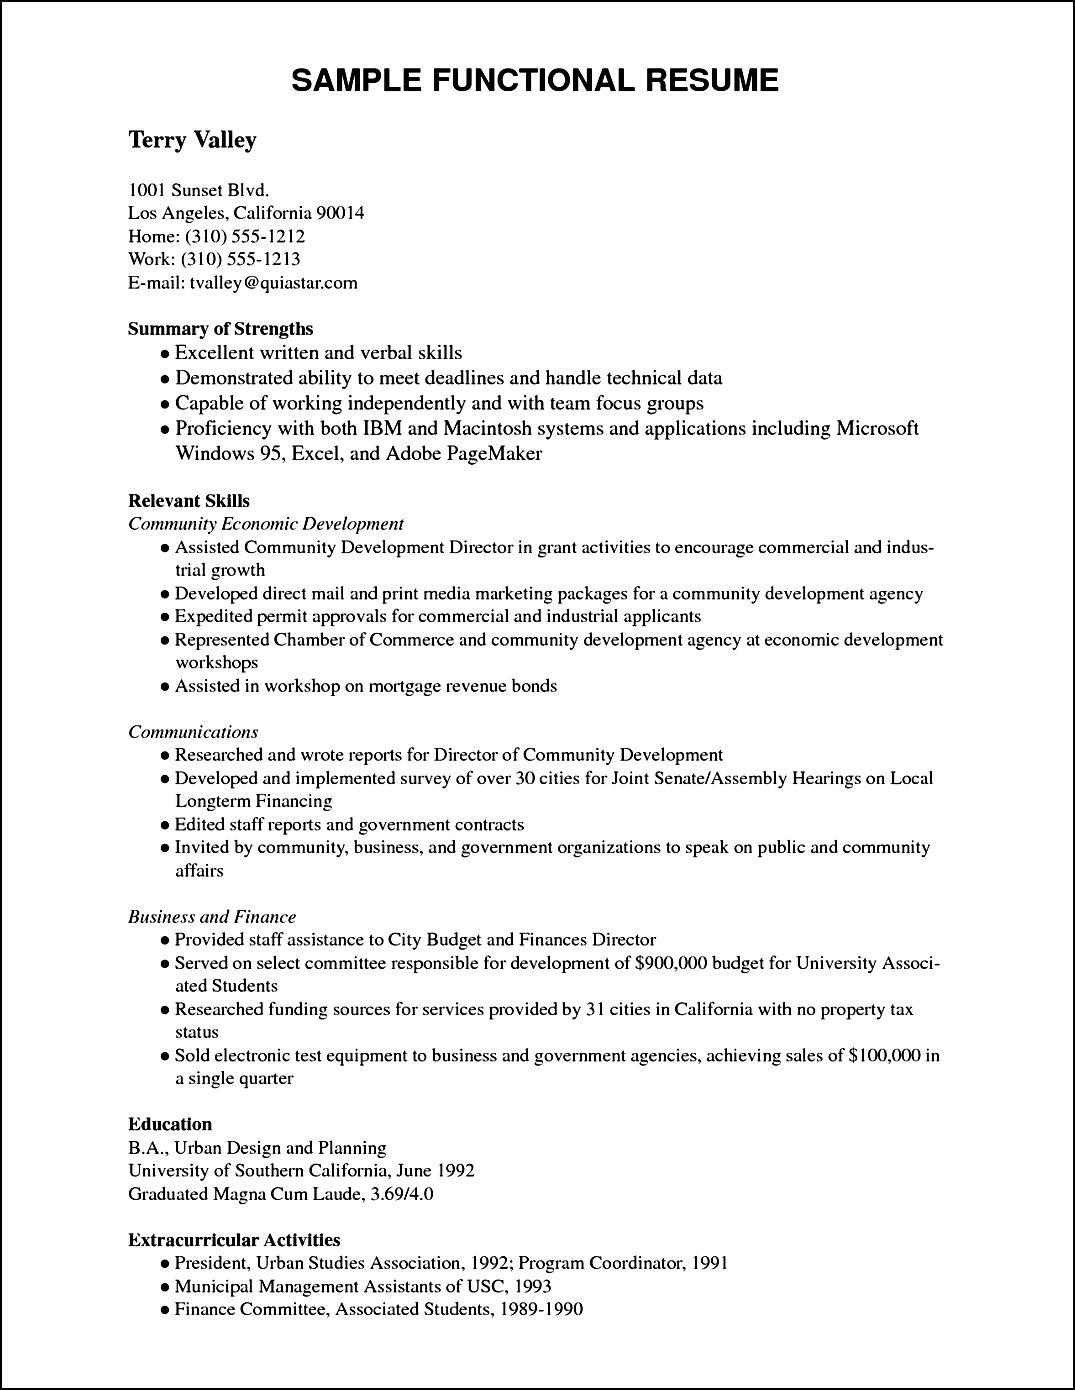 Sample Curriculum Vitae Pdf | Free Samples , Examples ...